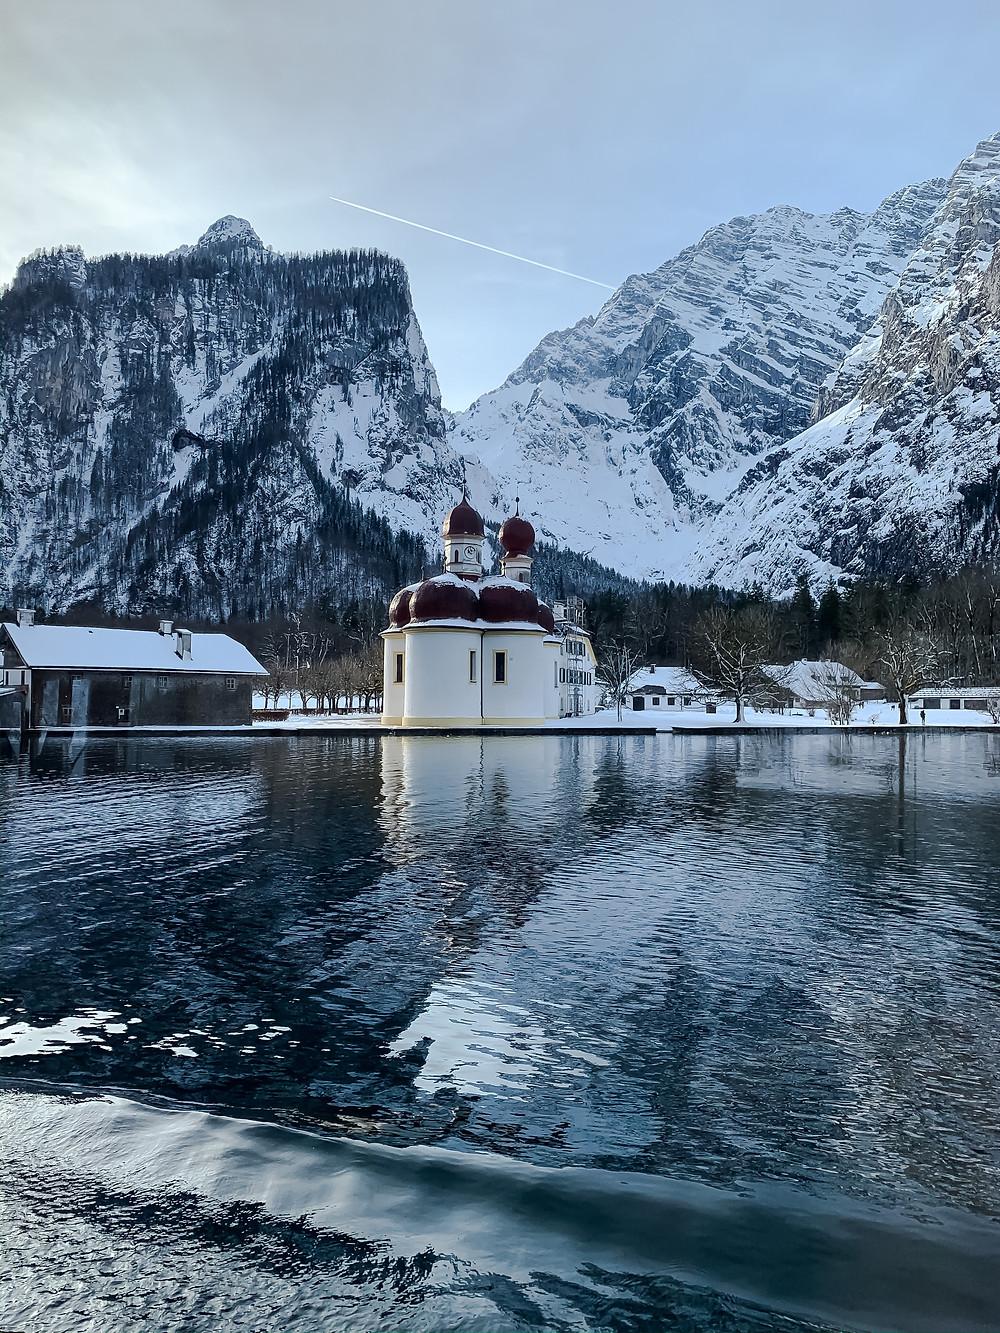 Bate-volta de Munique | 5 cidades fofas